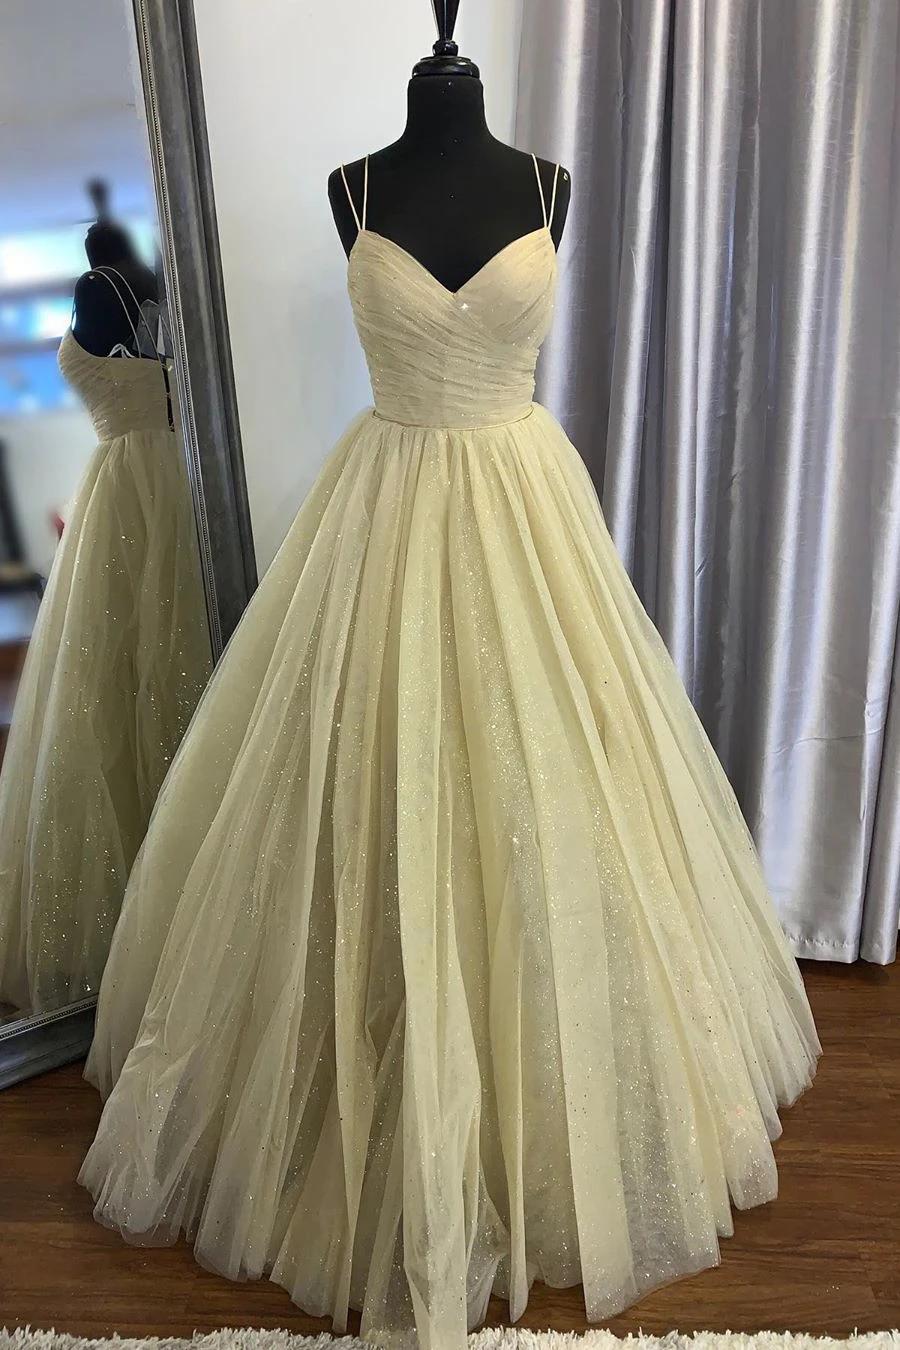 Elegant Spaghetti Straps A Line Yellow Long Prom Dress Prom Dresses Yellow Formal Evening Dresses Glitter Prom Dresses [ 1350 x 900 Pixel ]